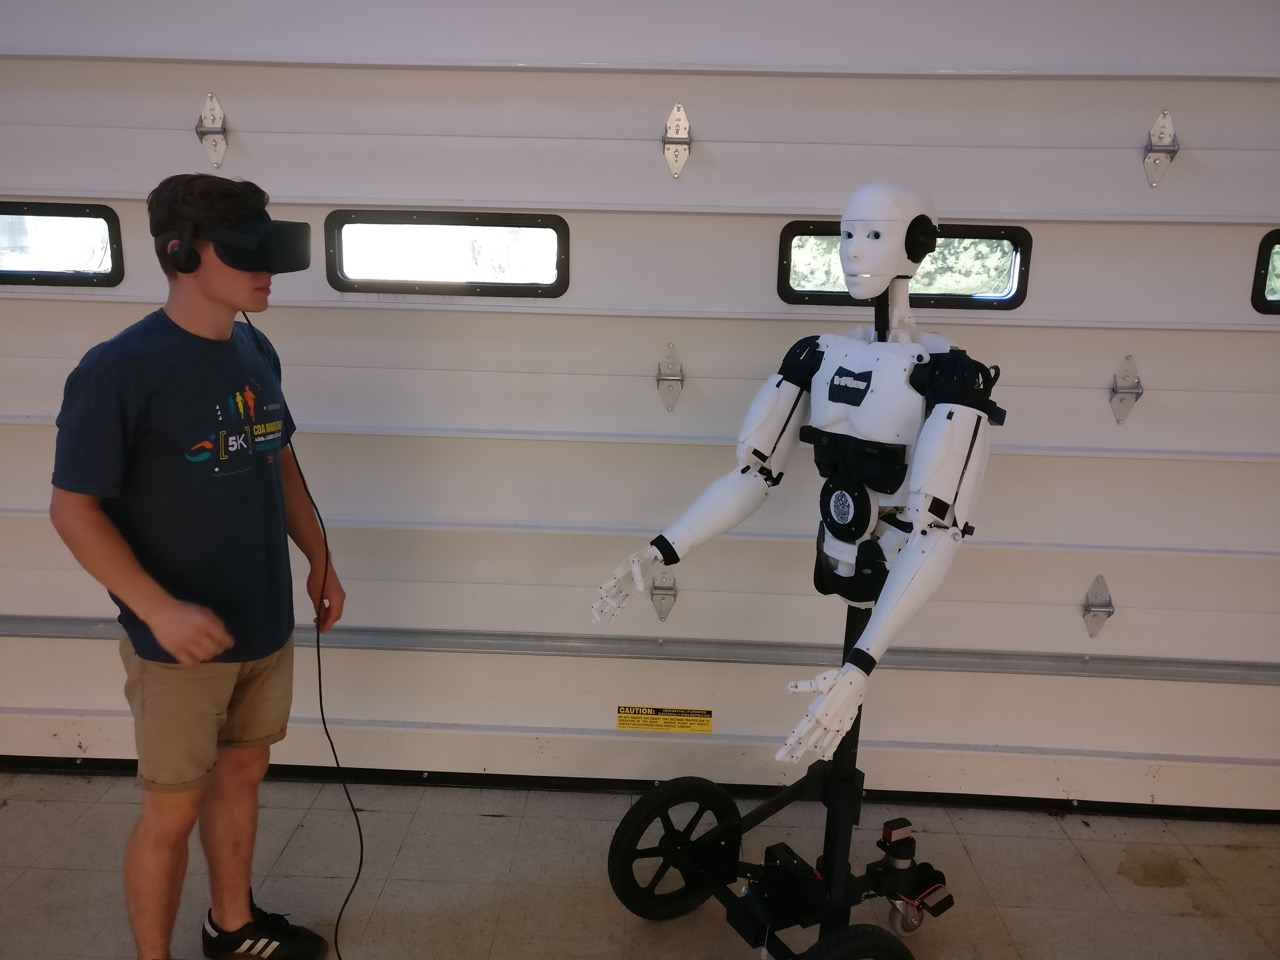 Robotics with Virtual Reality Integration